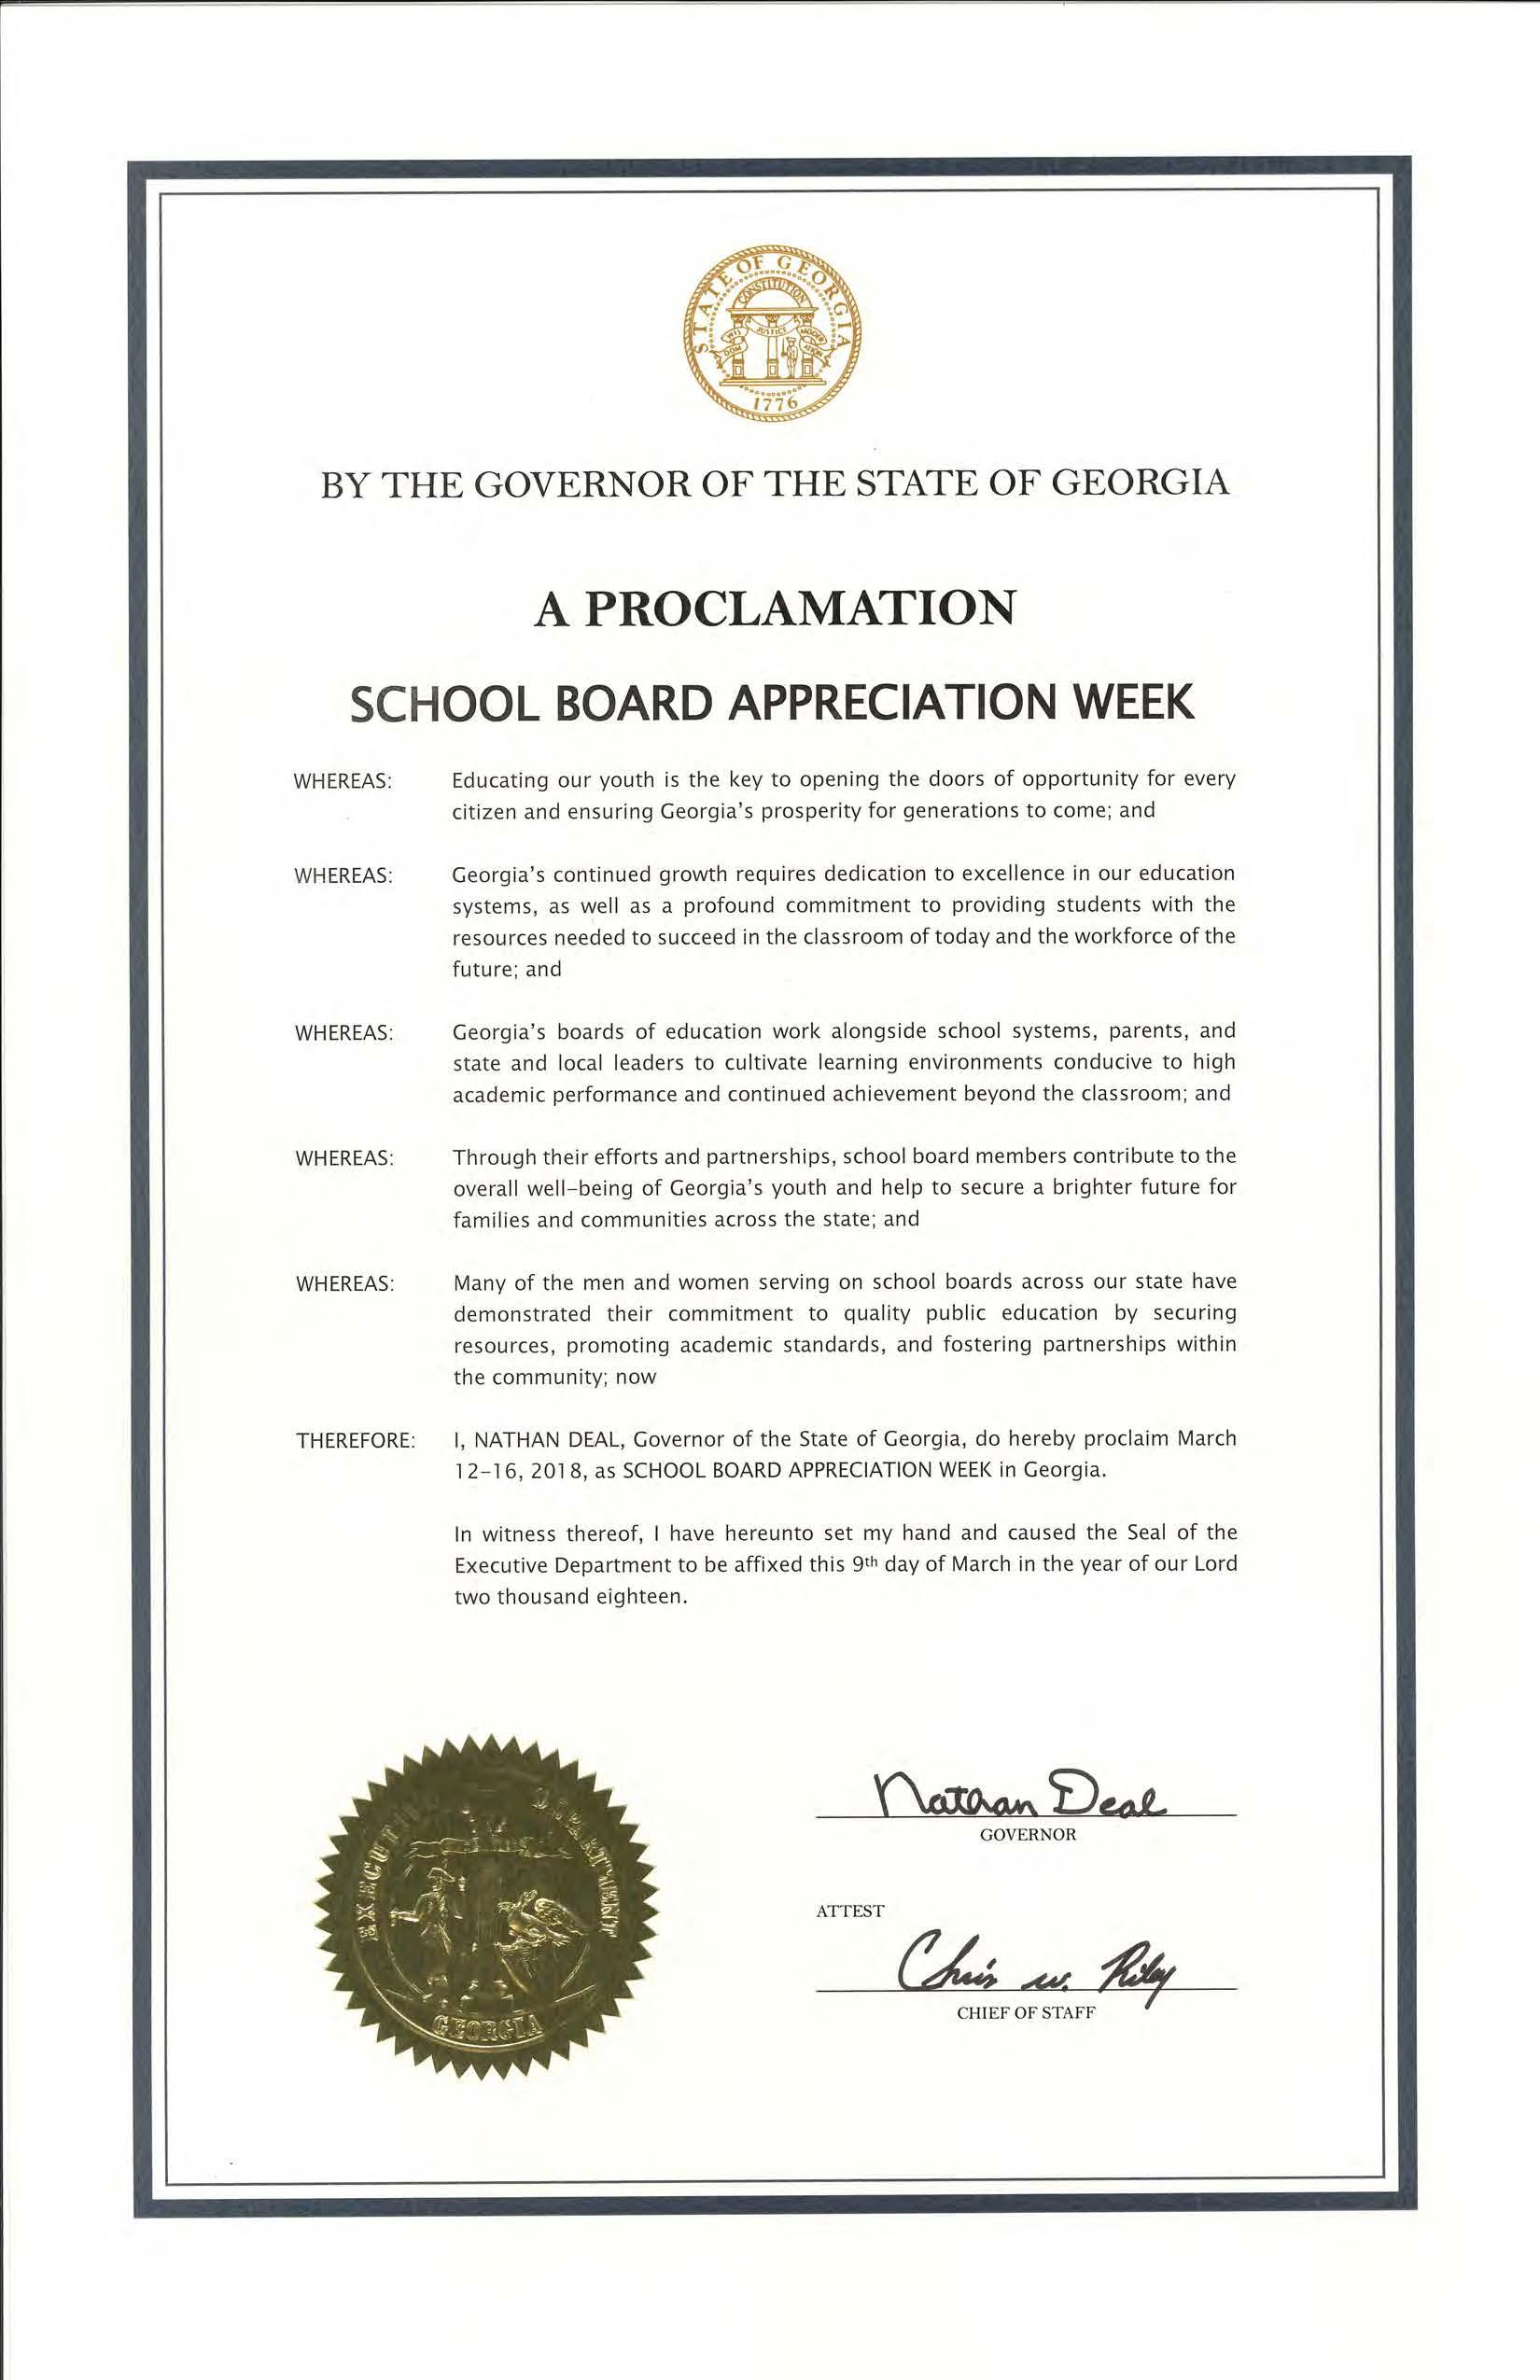 Govn Proclamation 2018 School Board Apprec Week Georgia School